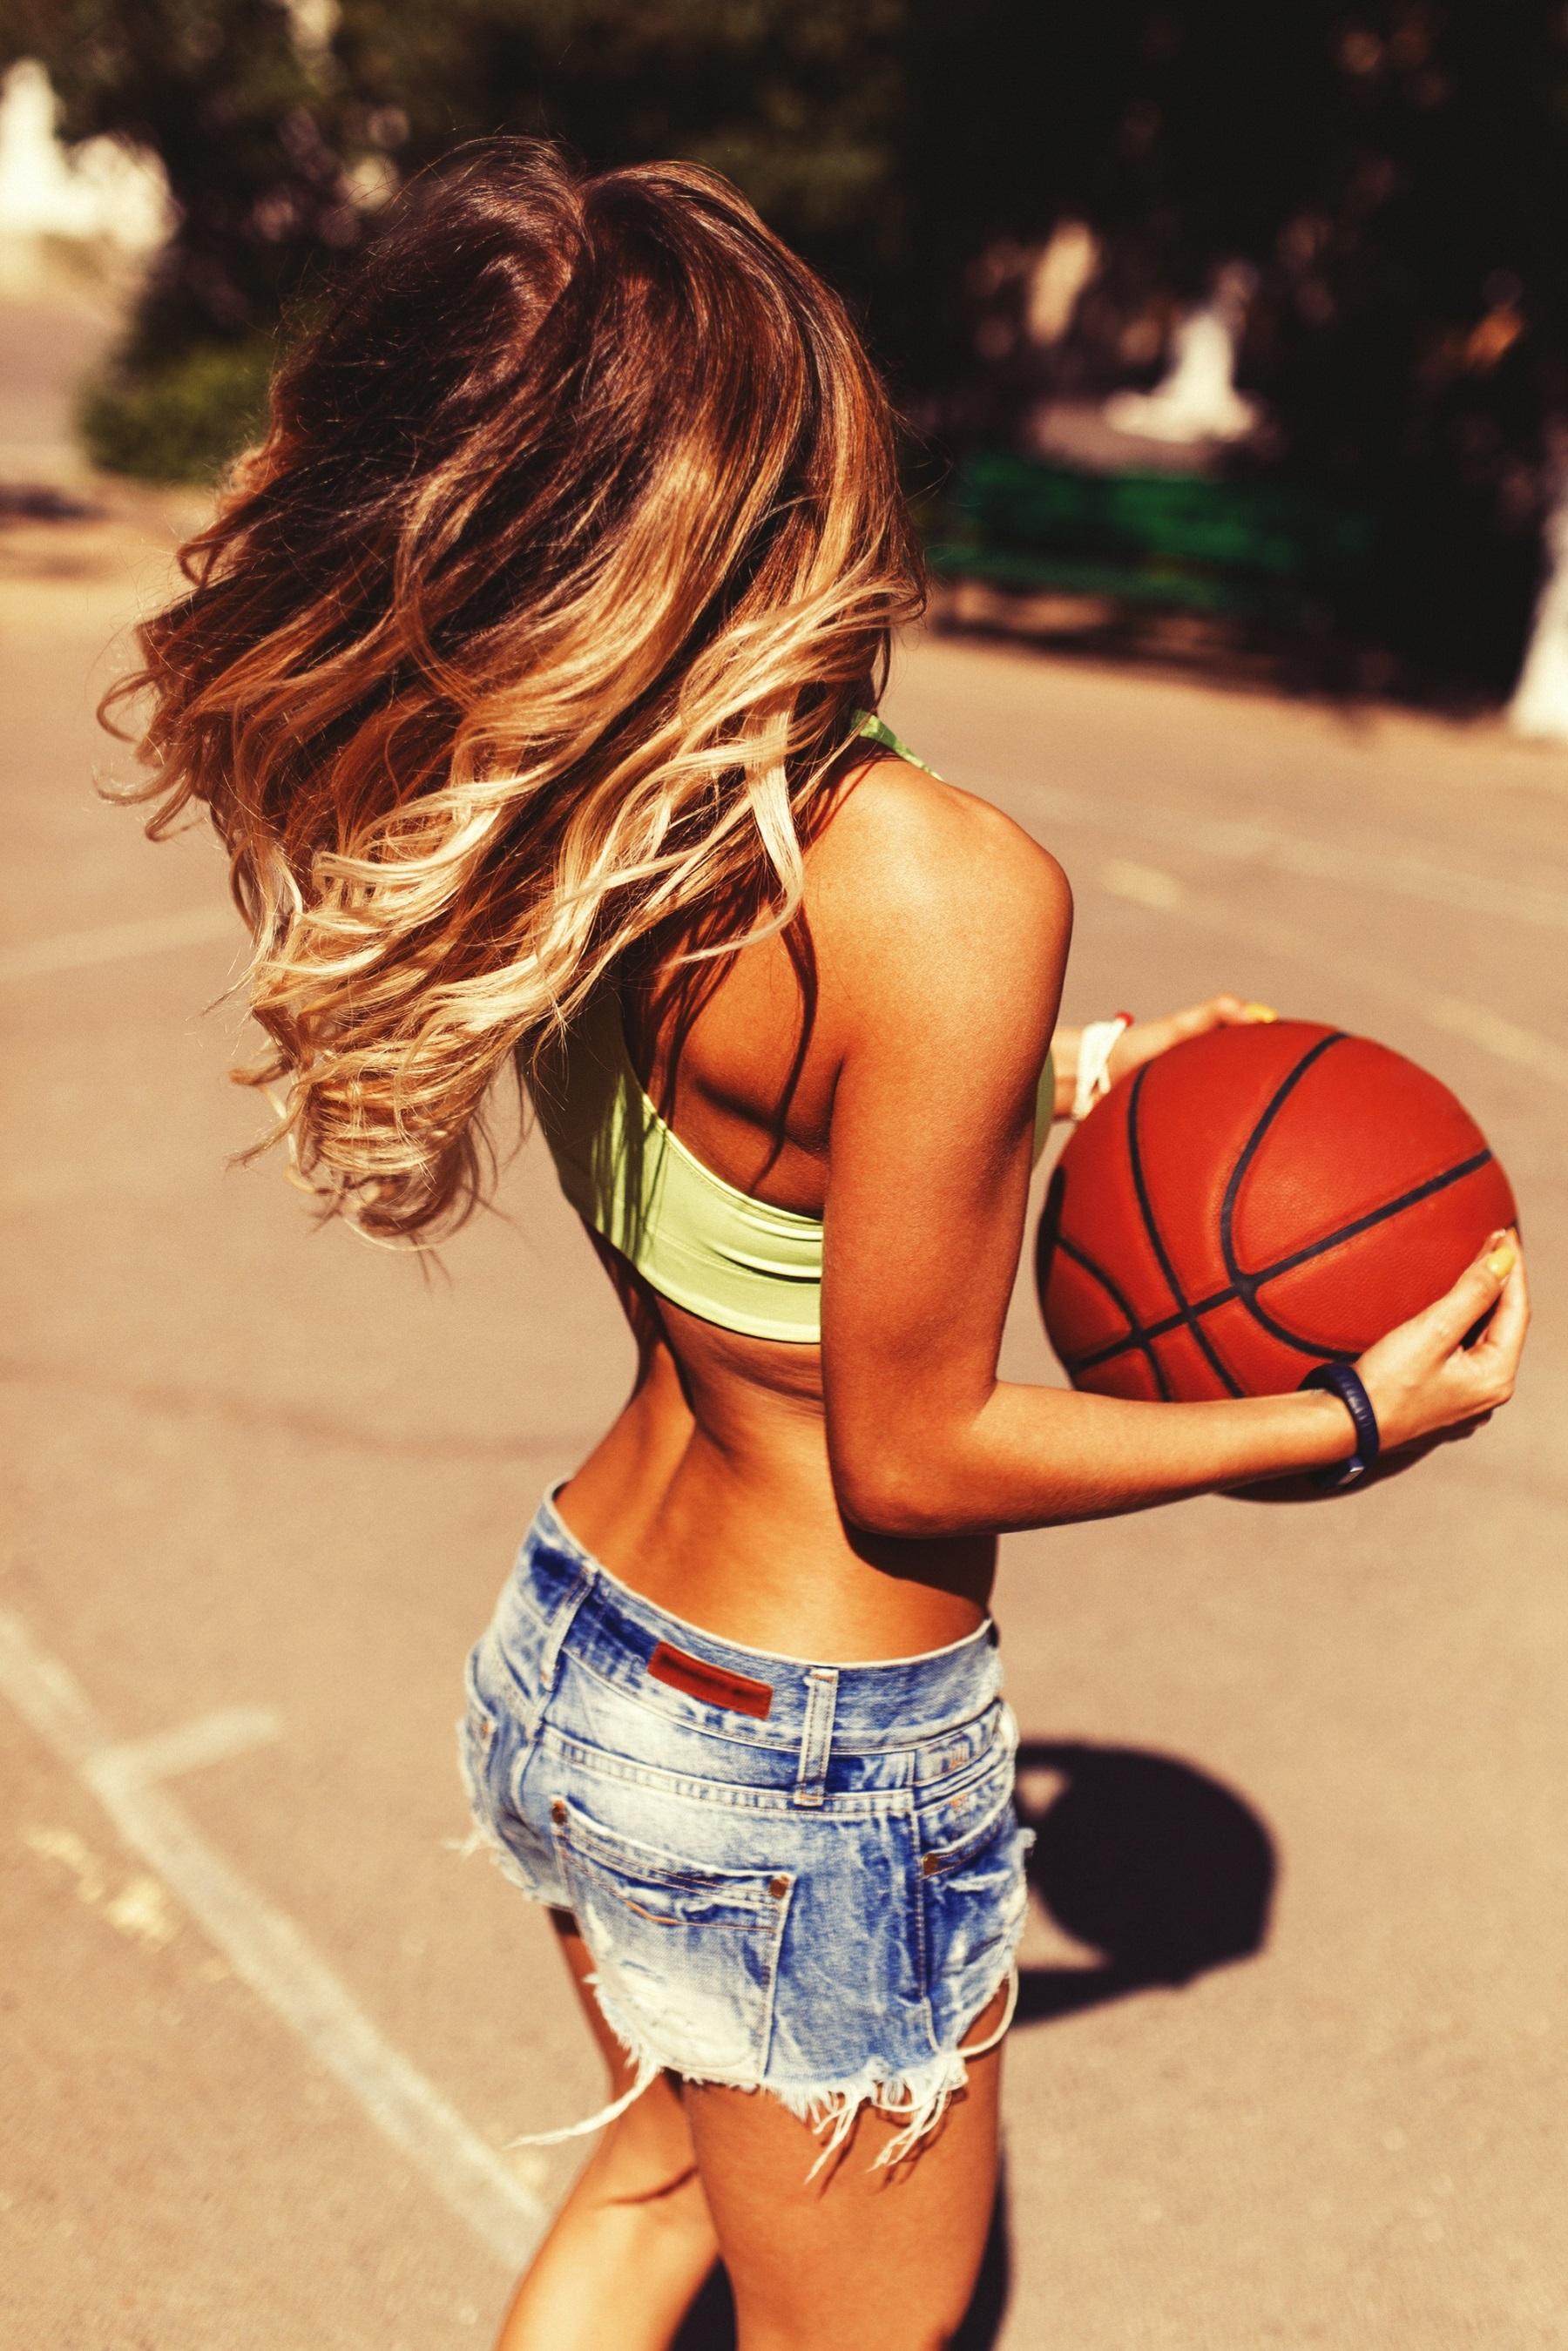 Sexy girl on the basketball court